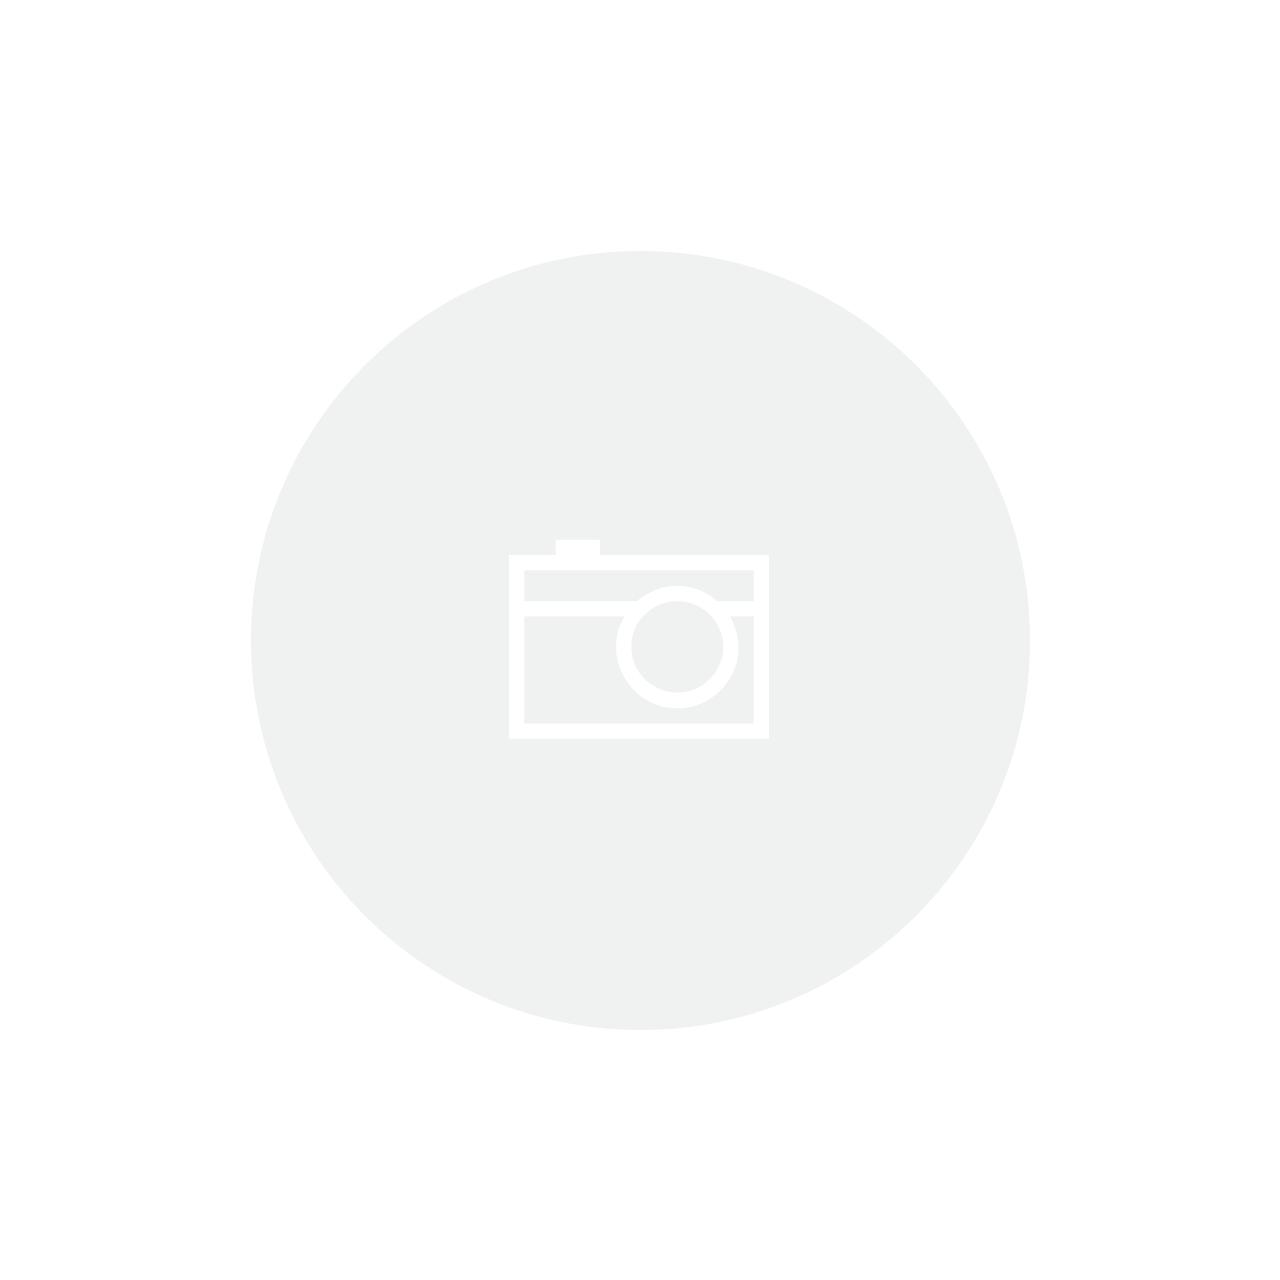 Fonte Thermaltake Smart Series 430W 80 Plus White - SPD-0430P